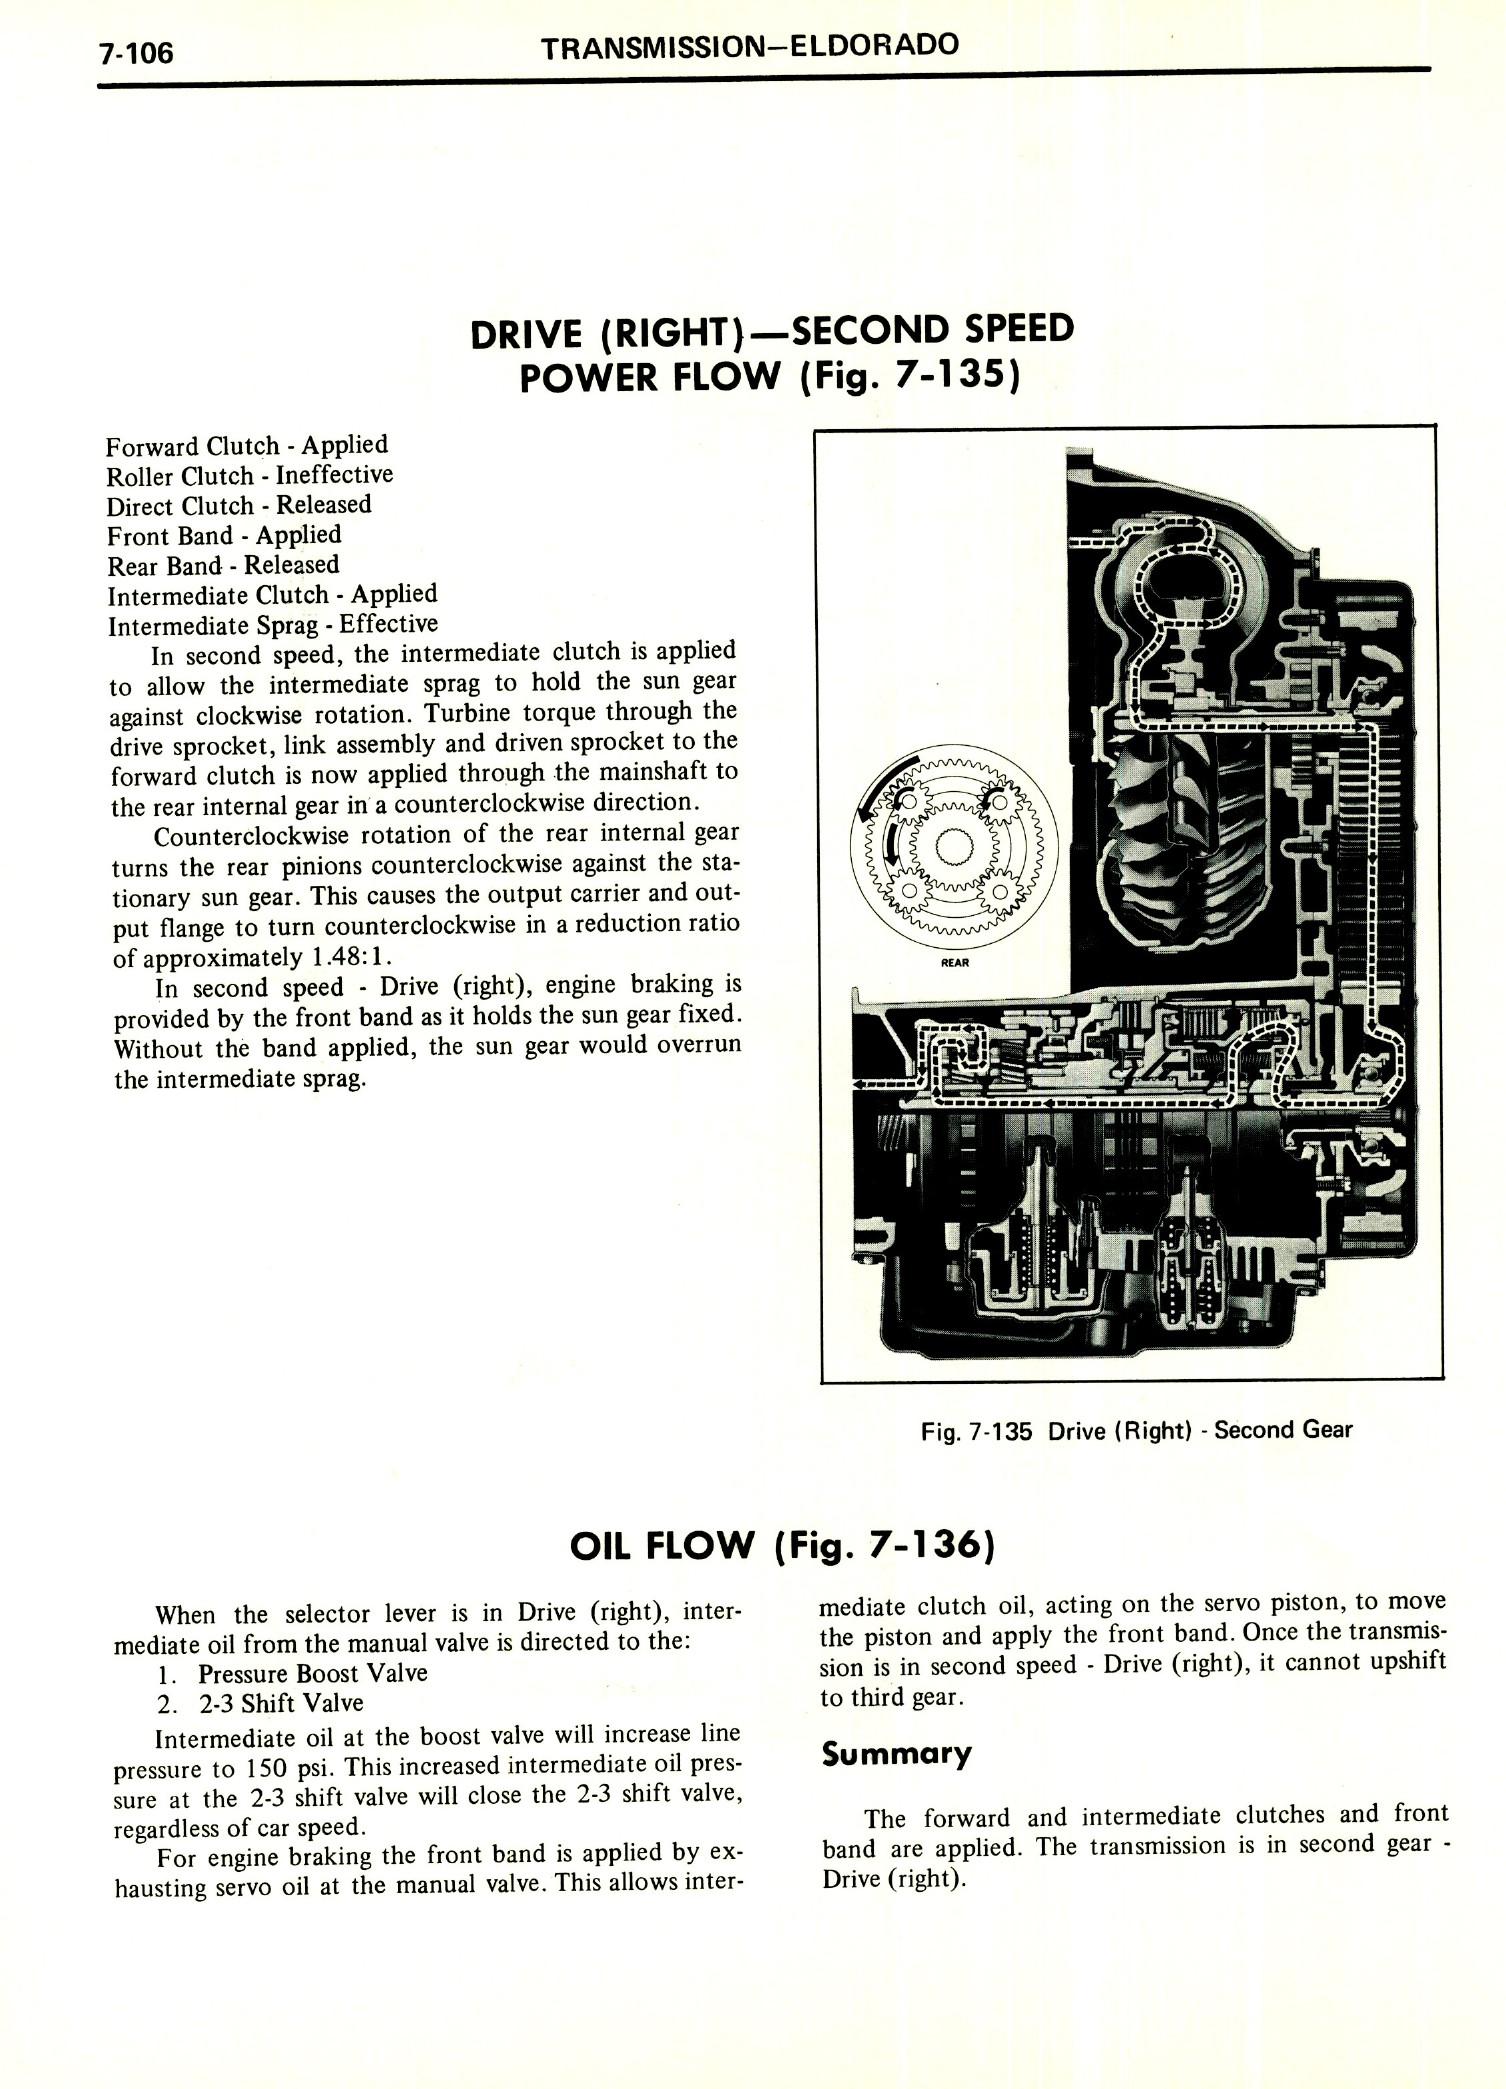 1971 Cadillac Shop Manual- Transmission Page 106 of 156